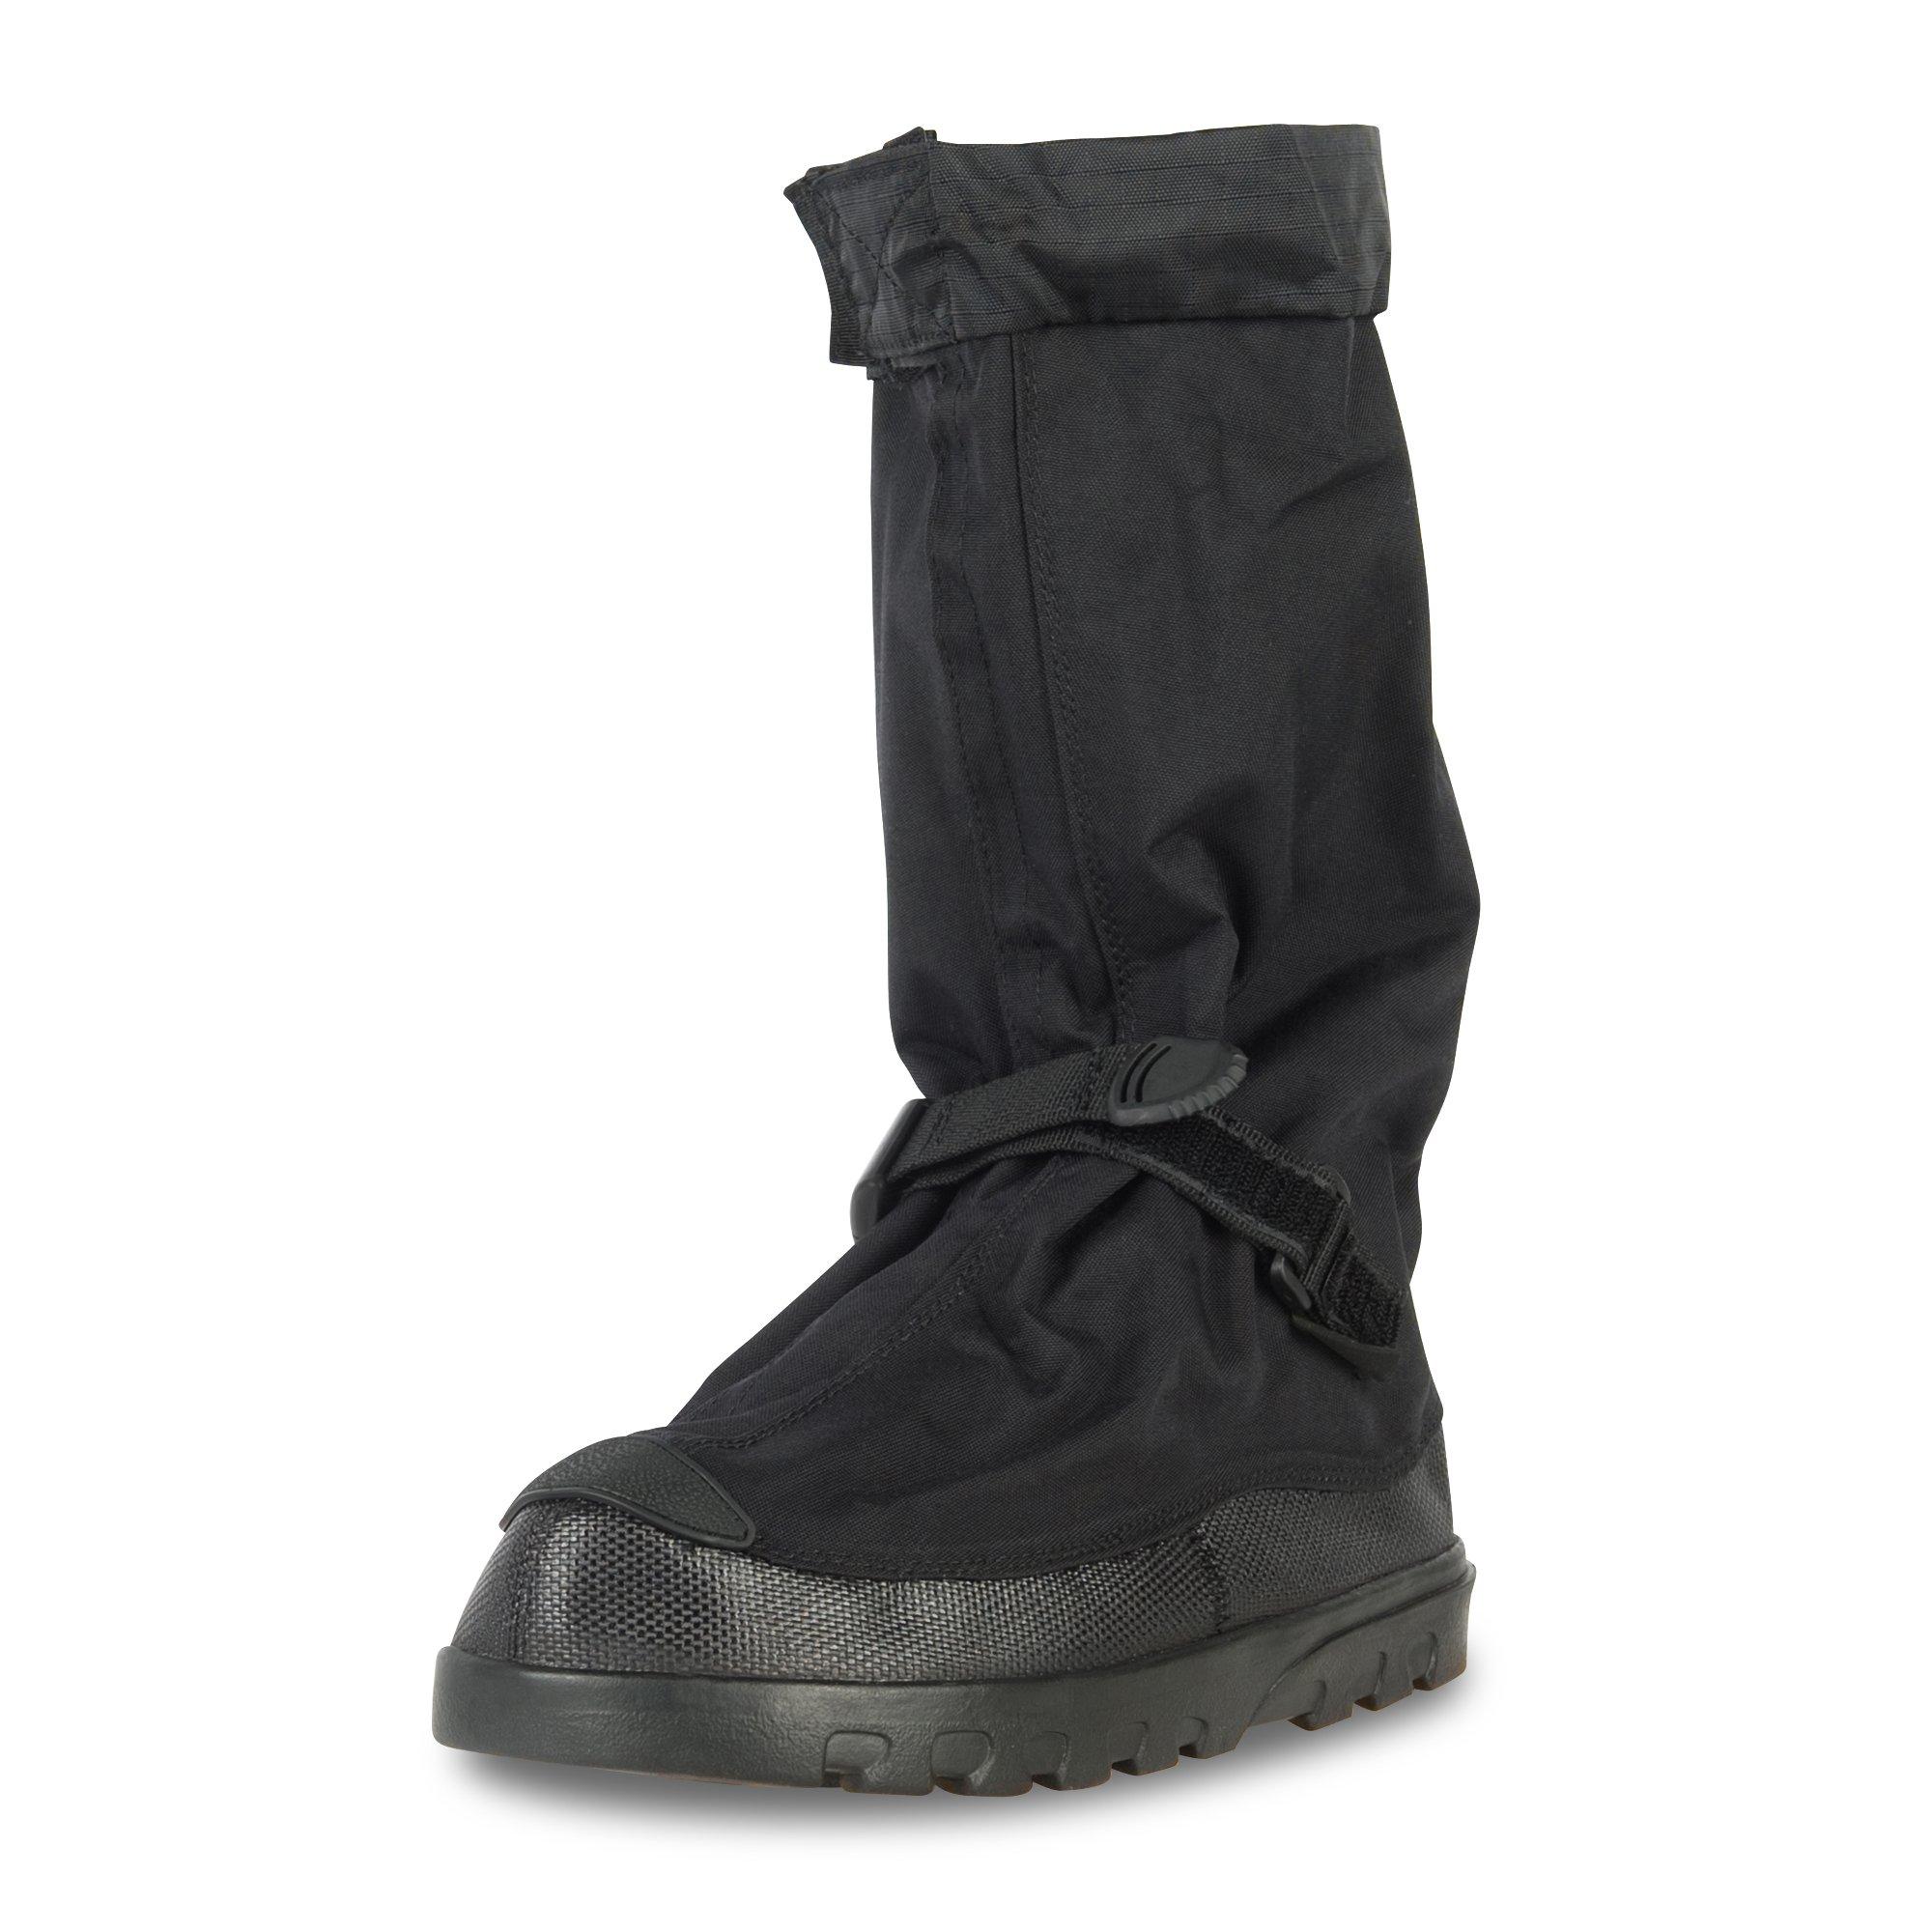 NEOS 15'' Adventurer All Season Waterproof Overshoes (ANN1)